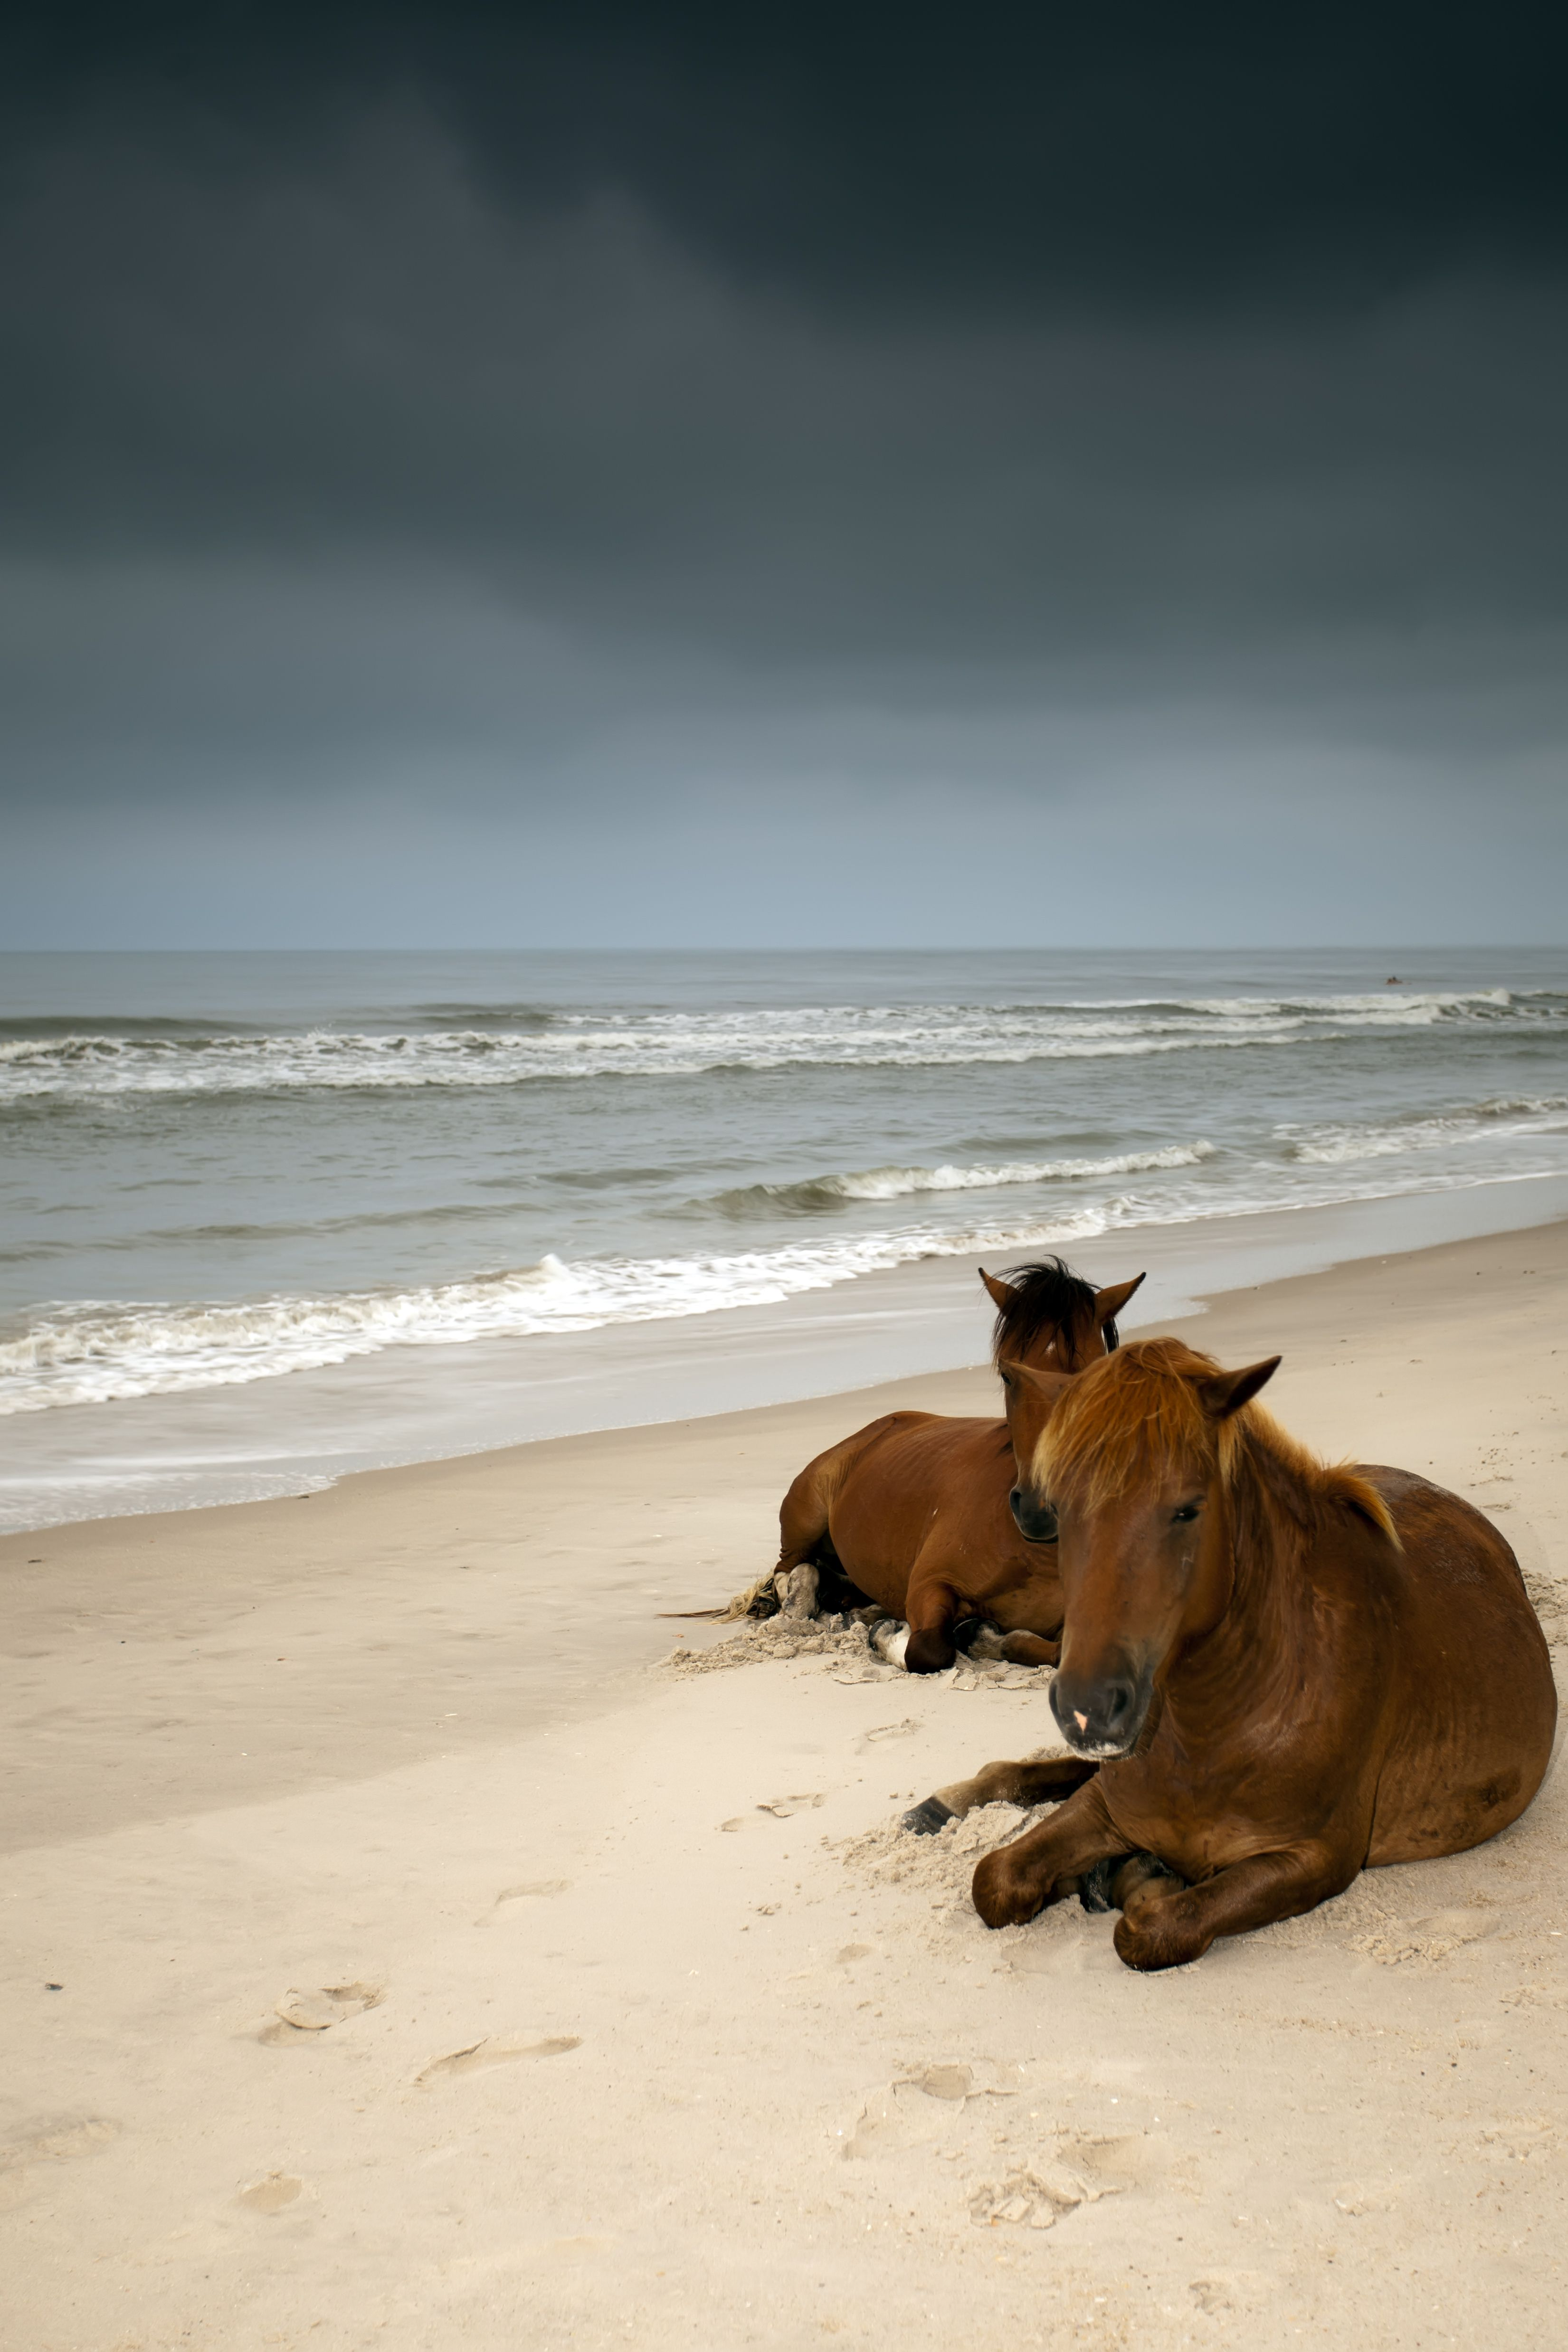 The 46 Best Coastal Towns in America - Best Beach Towns in